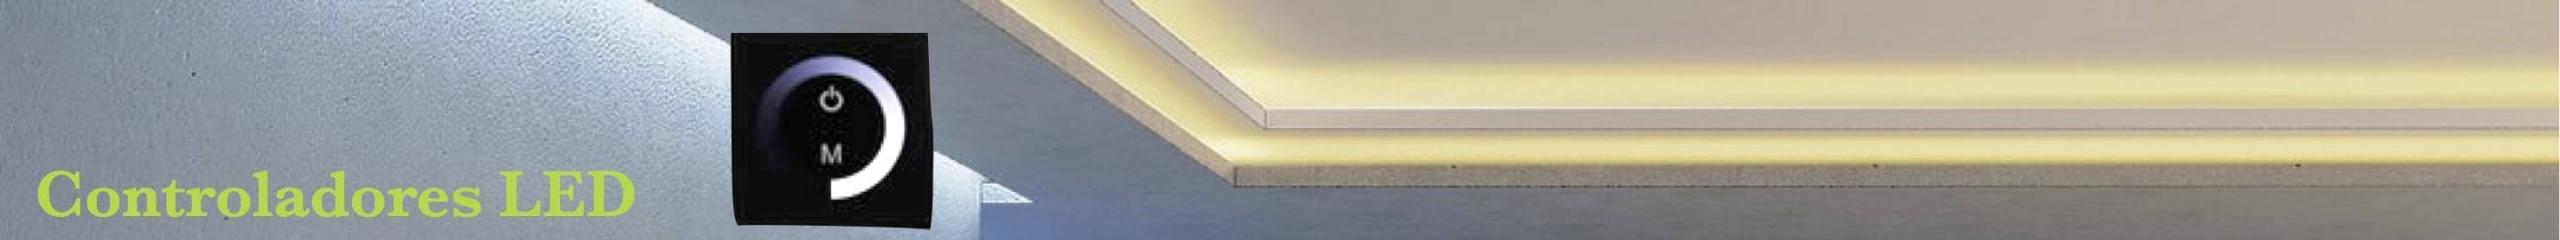 Controladores Tiras LED